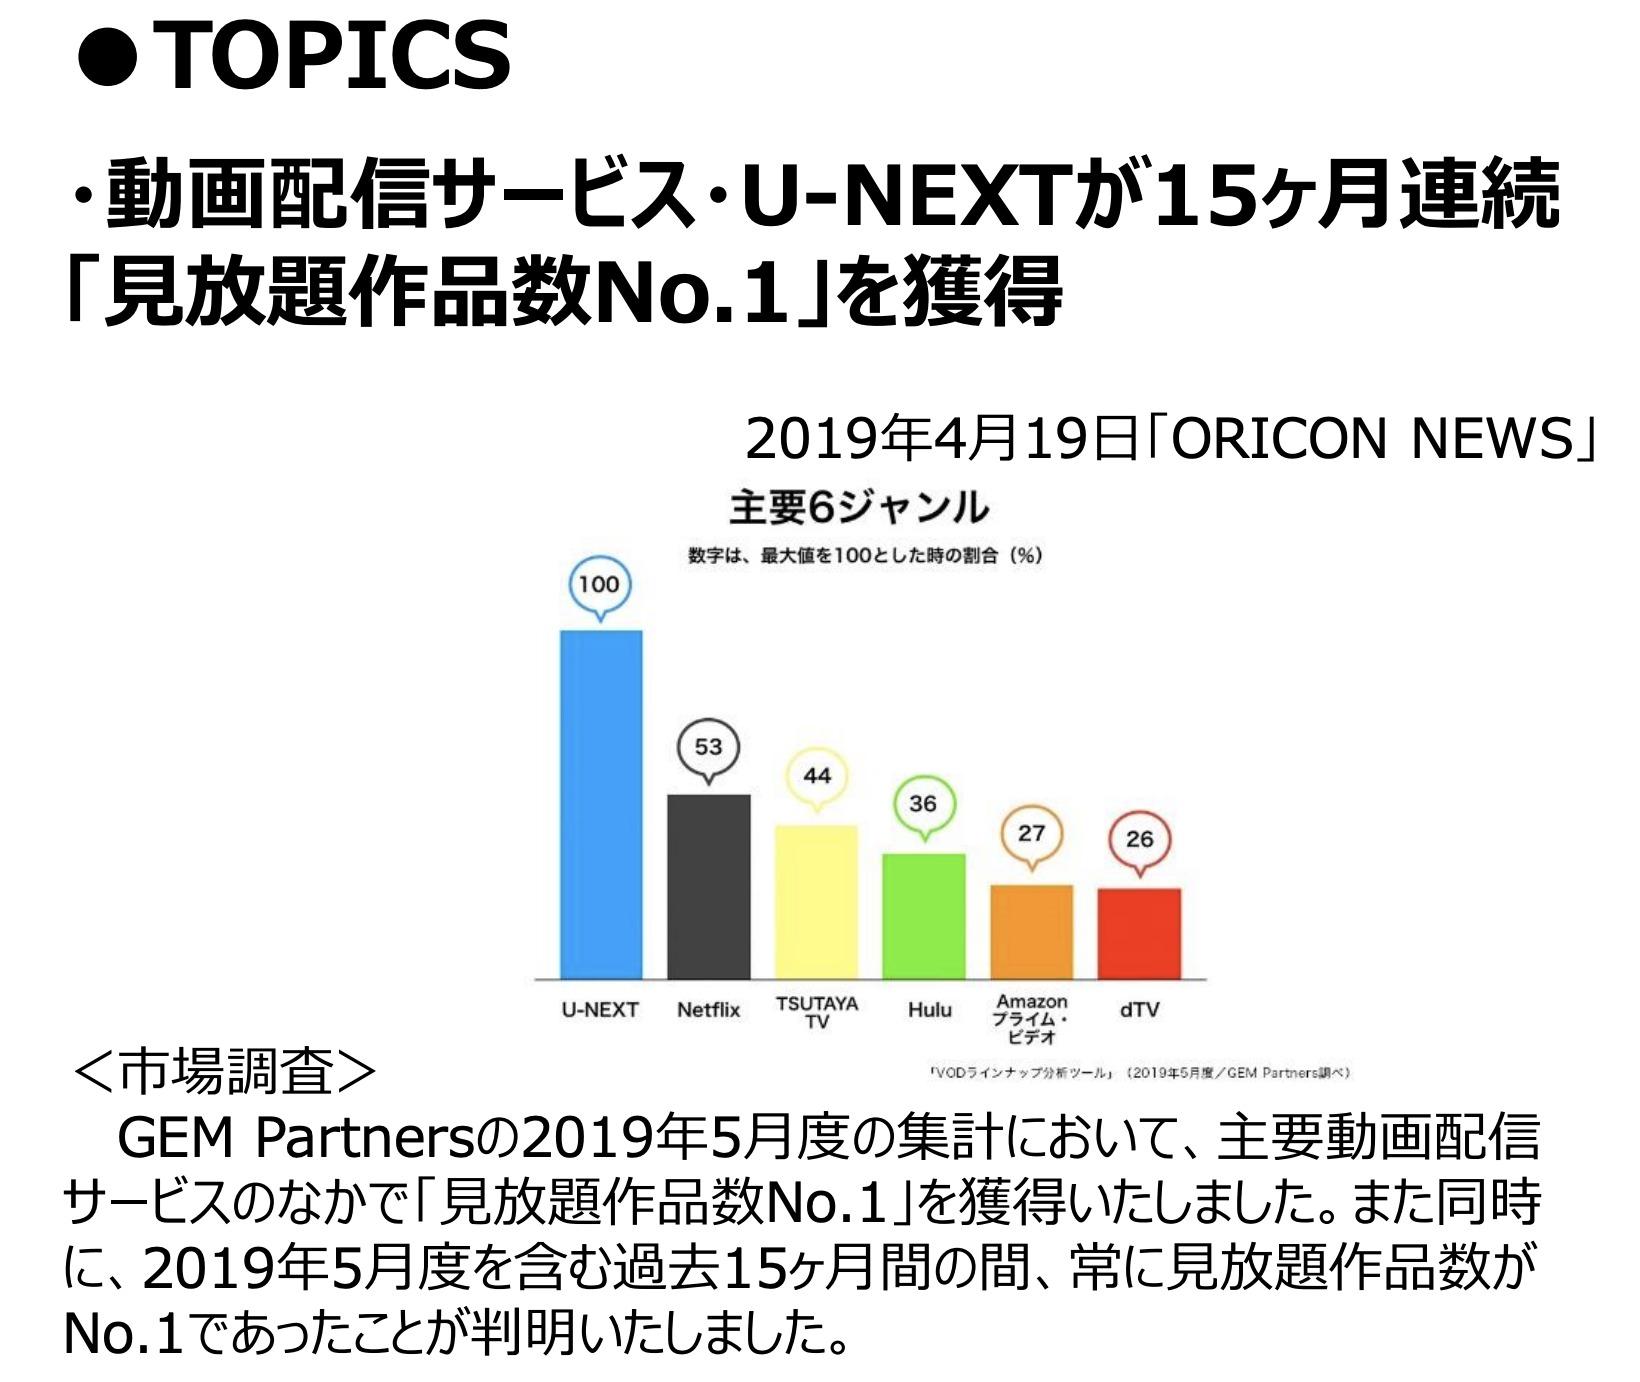 出典:USEN NEXT HD 2019年8月期決算発表資料より